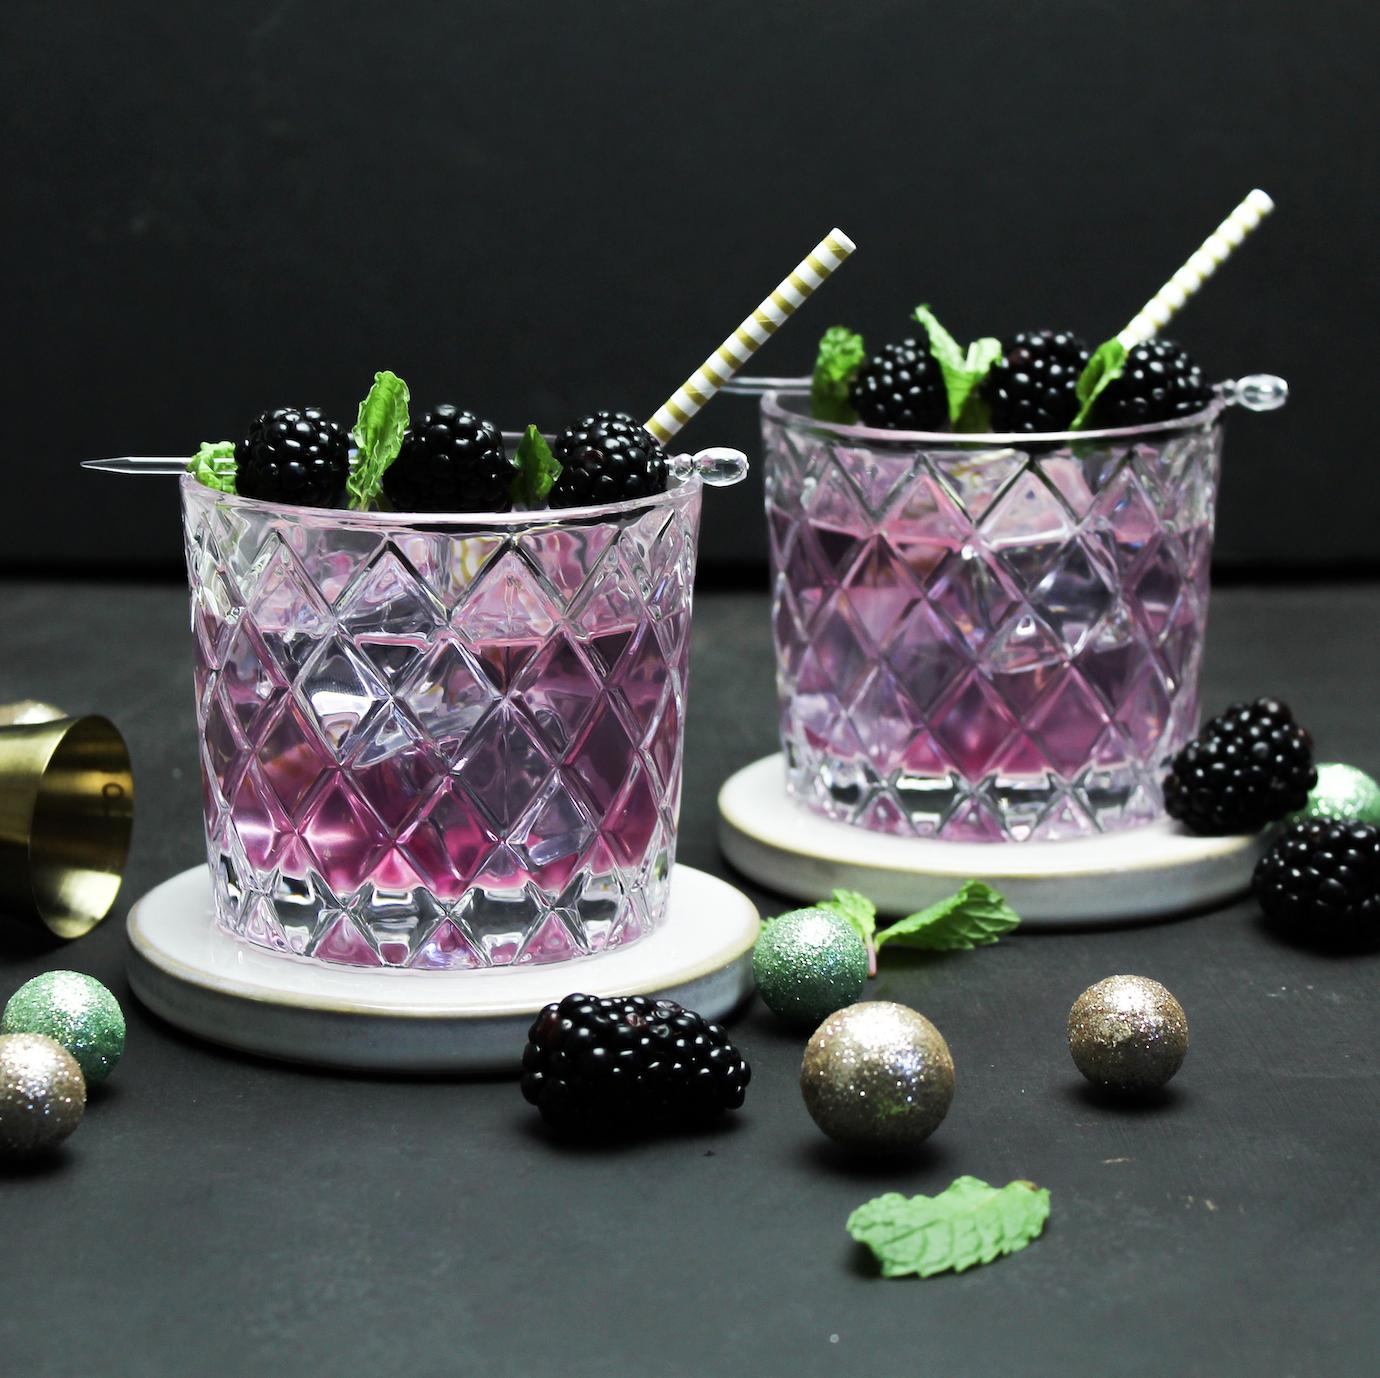 Image of Blackberry Lavender Gin Cocktail